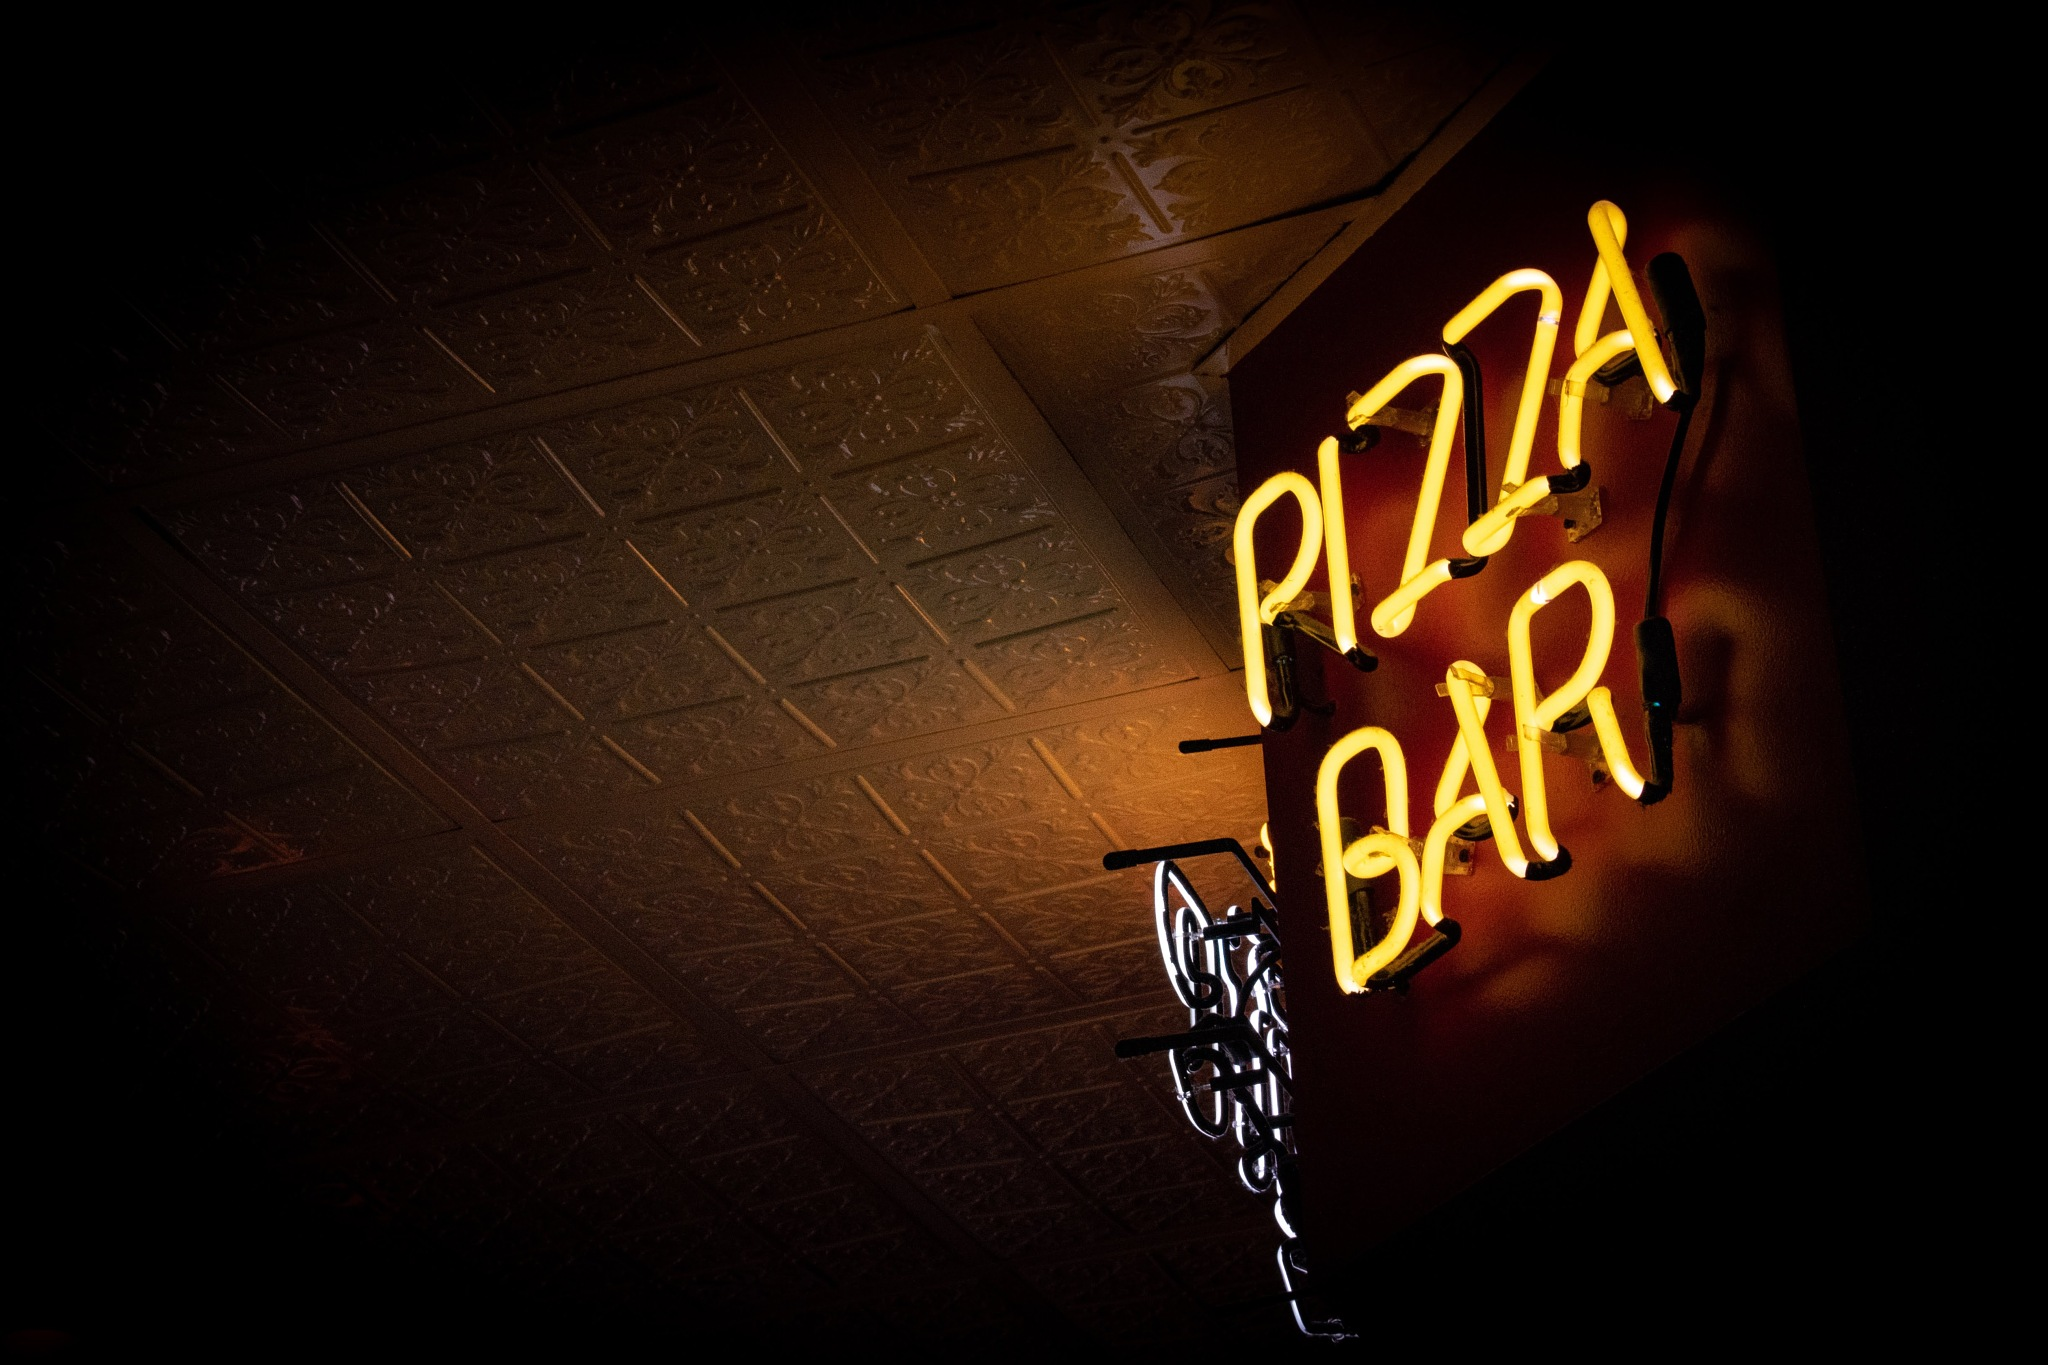 Pizza Bar by Crystal Ramos